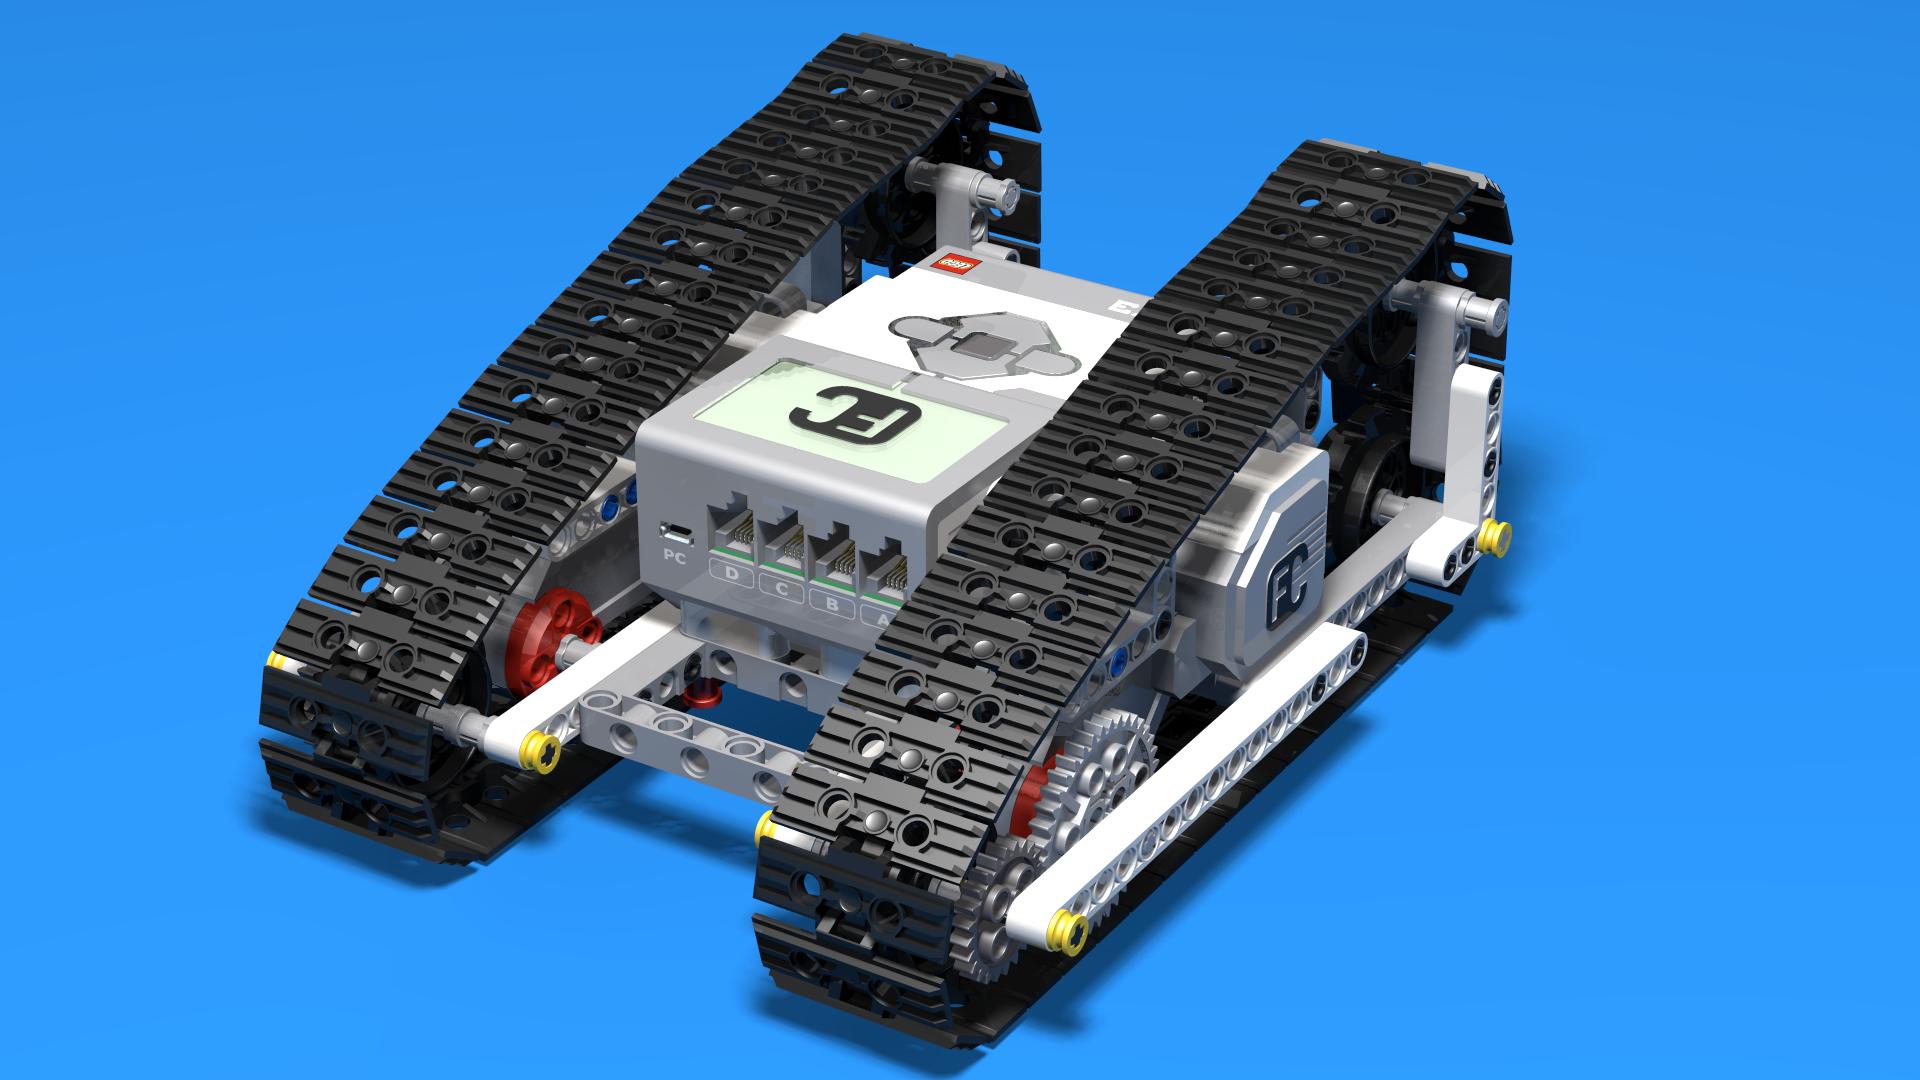 LEGO Mindstorms EV3 Iquzator Ev3 Tank Robot Fllcasts